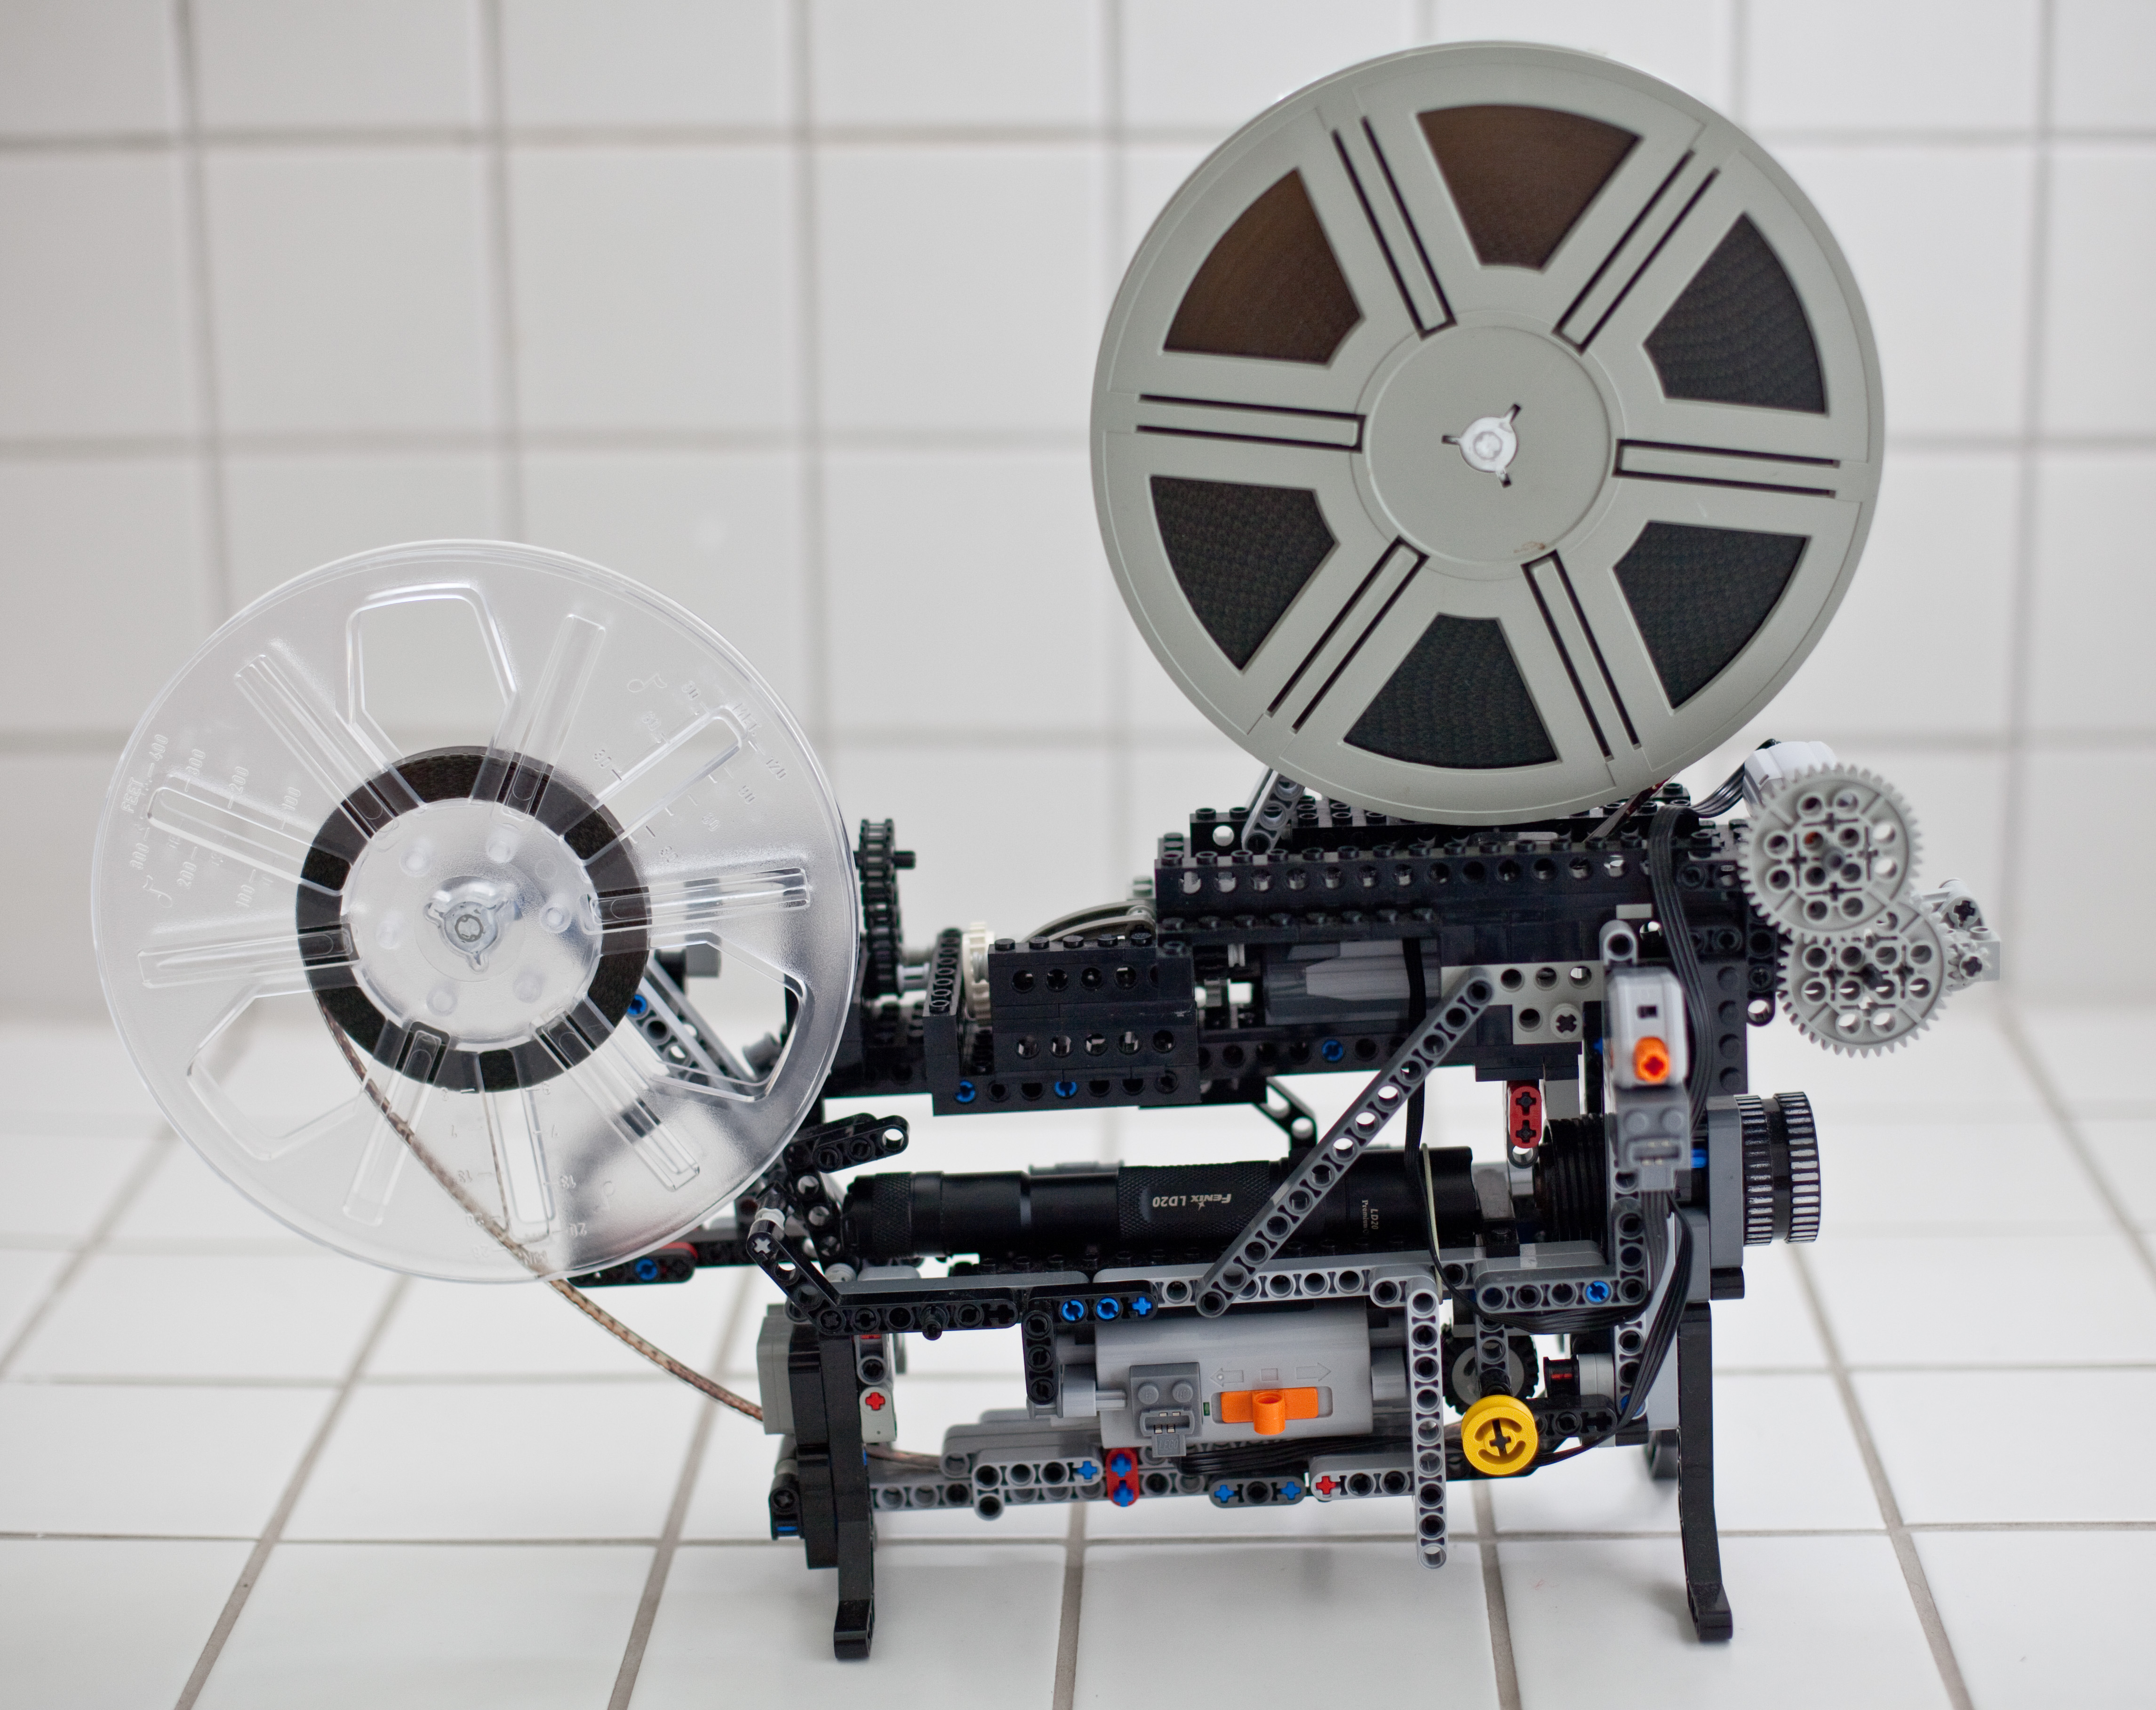 Lego Technic Super-8 Projektor | filmkorn